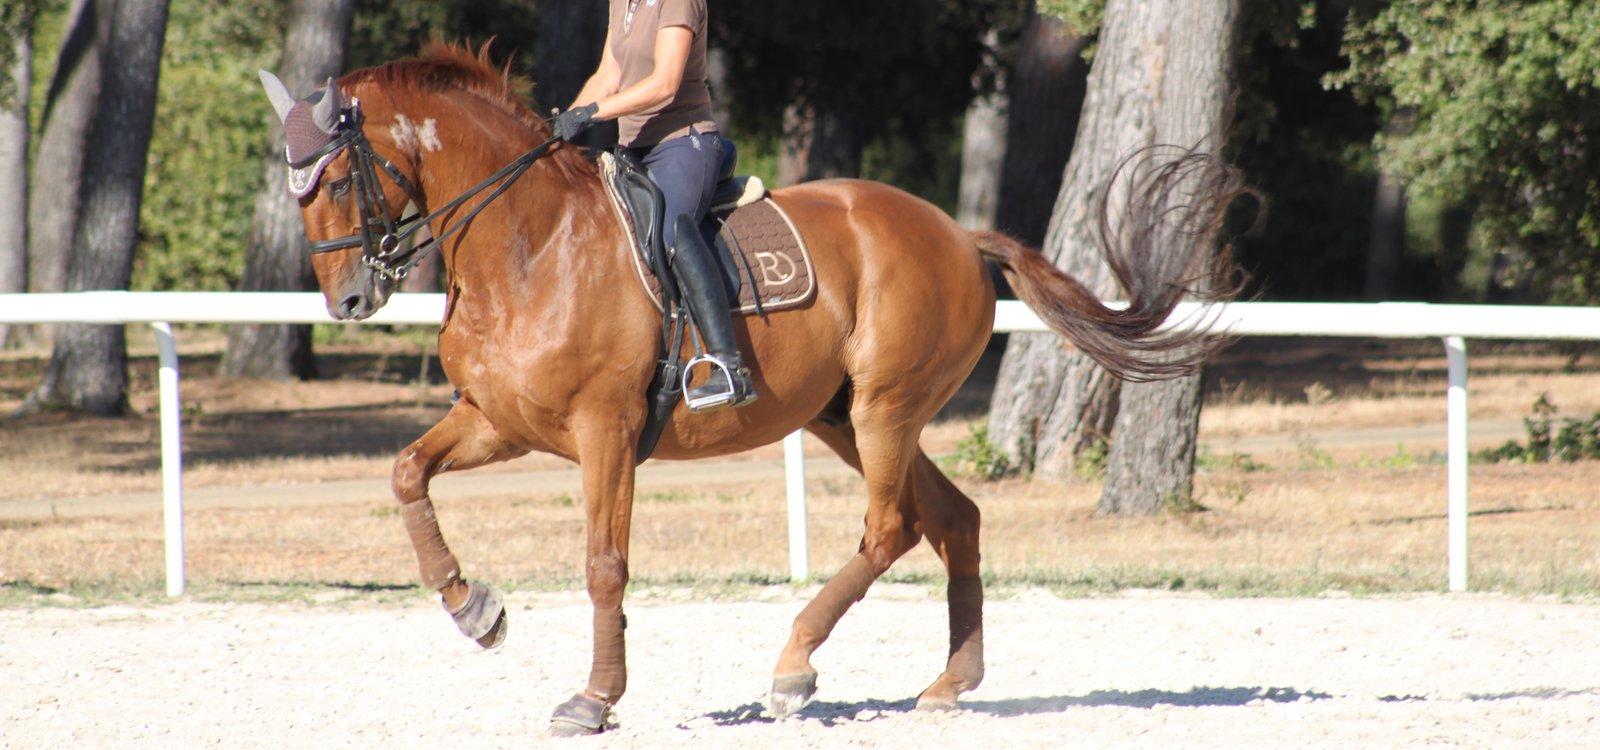 chevaux-dressage-darwin-de-pic-7